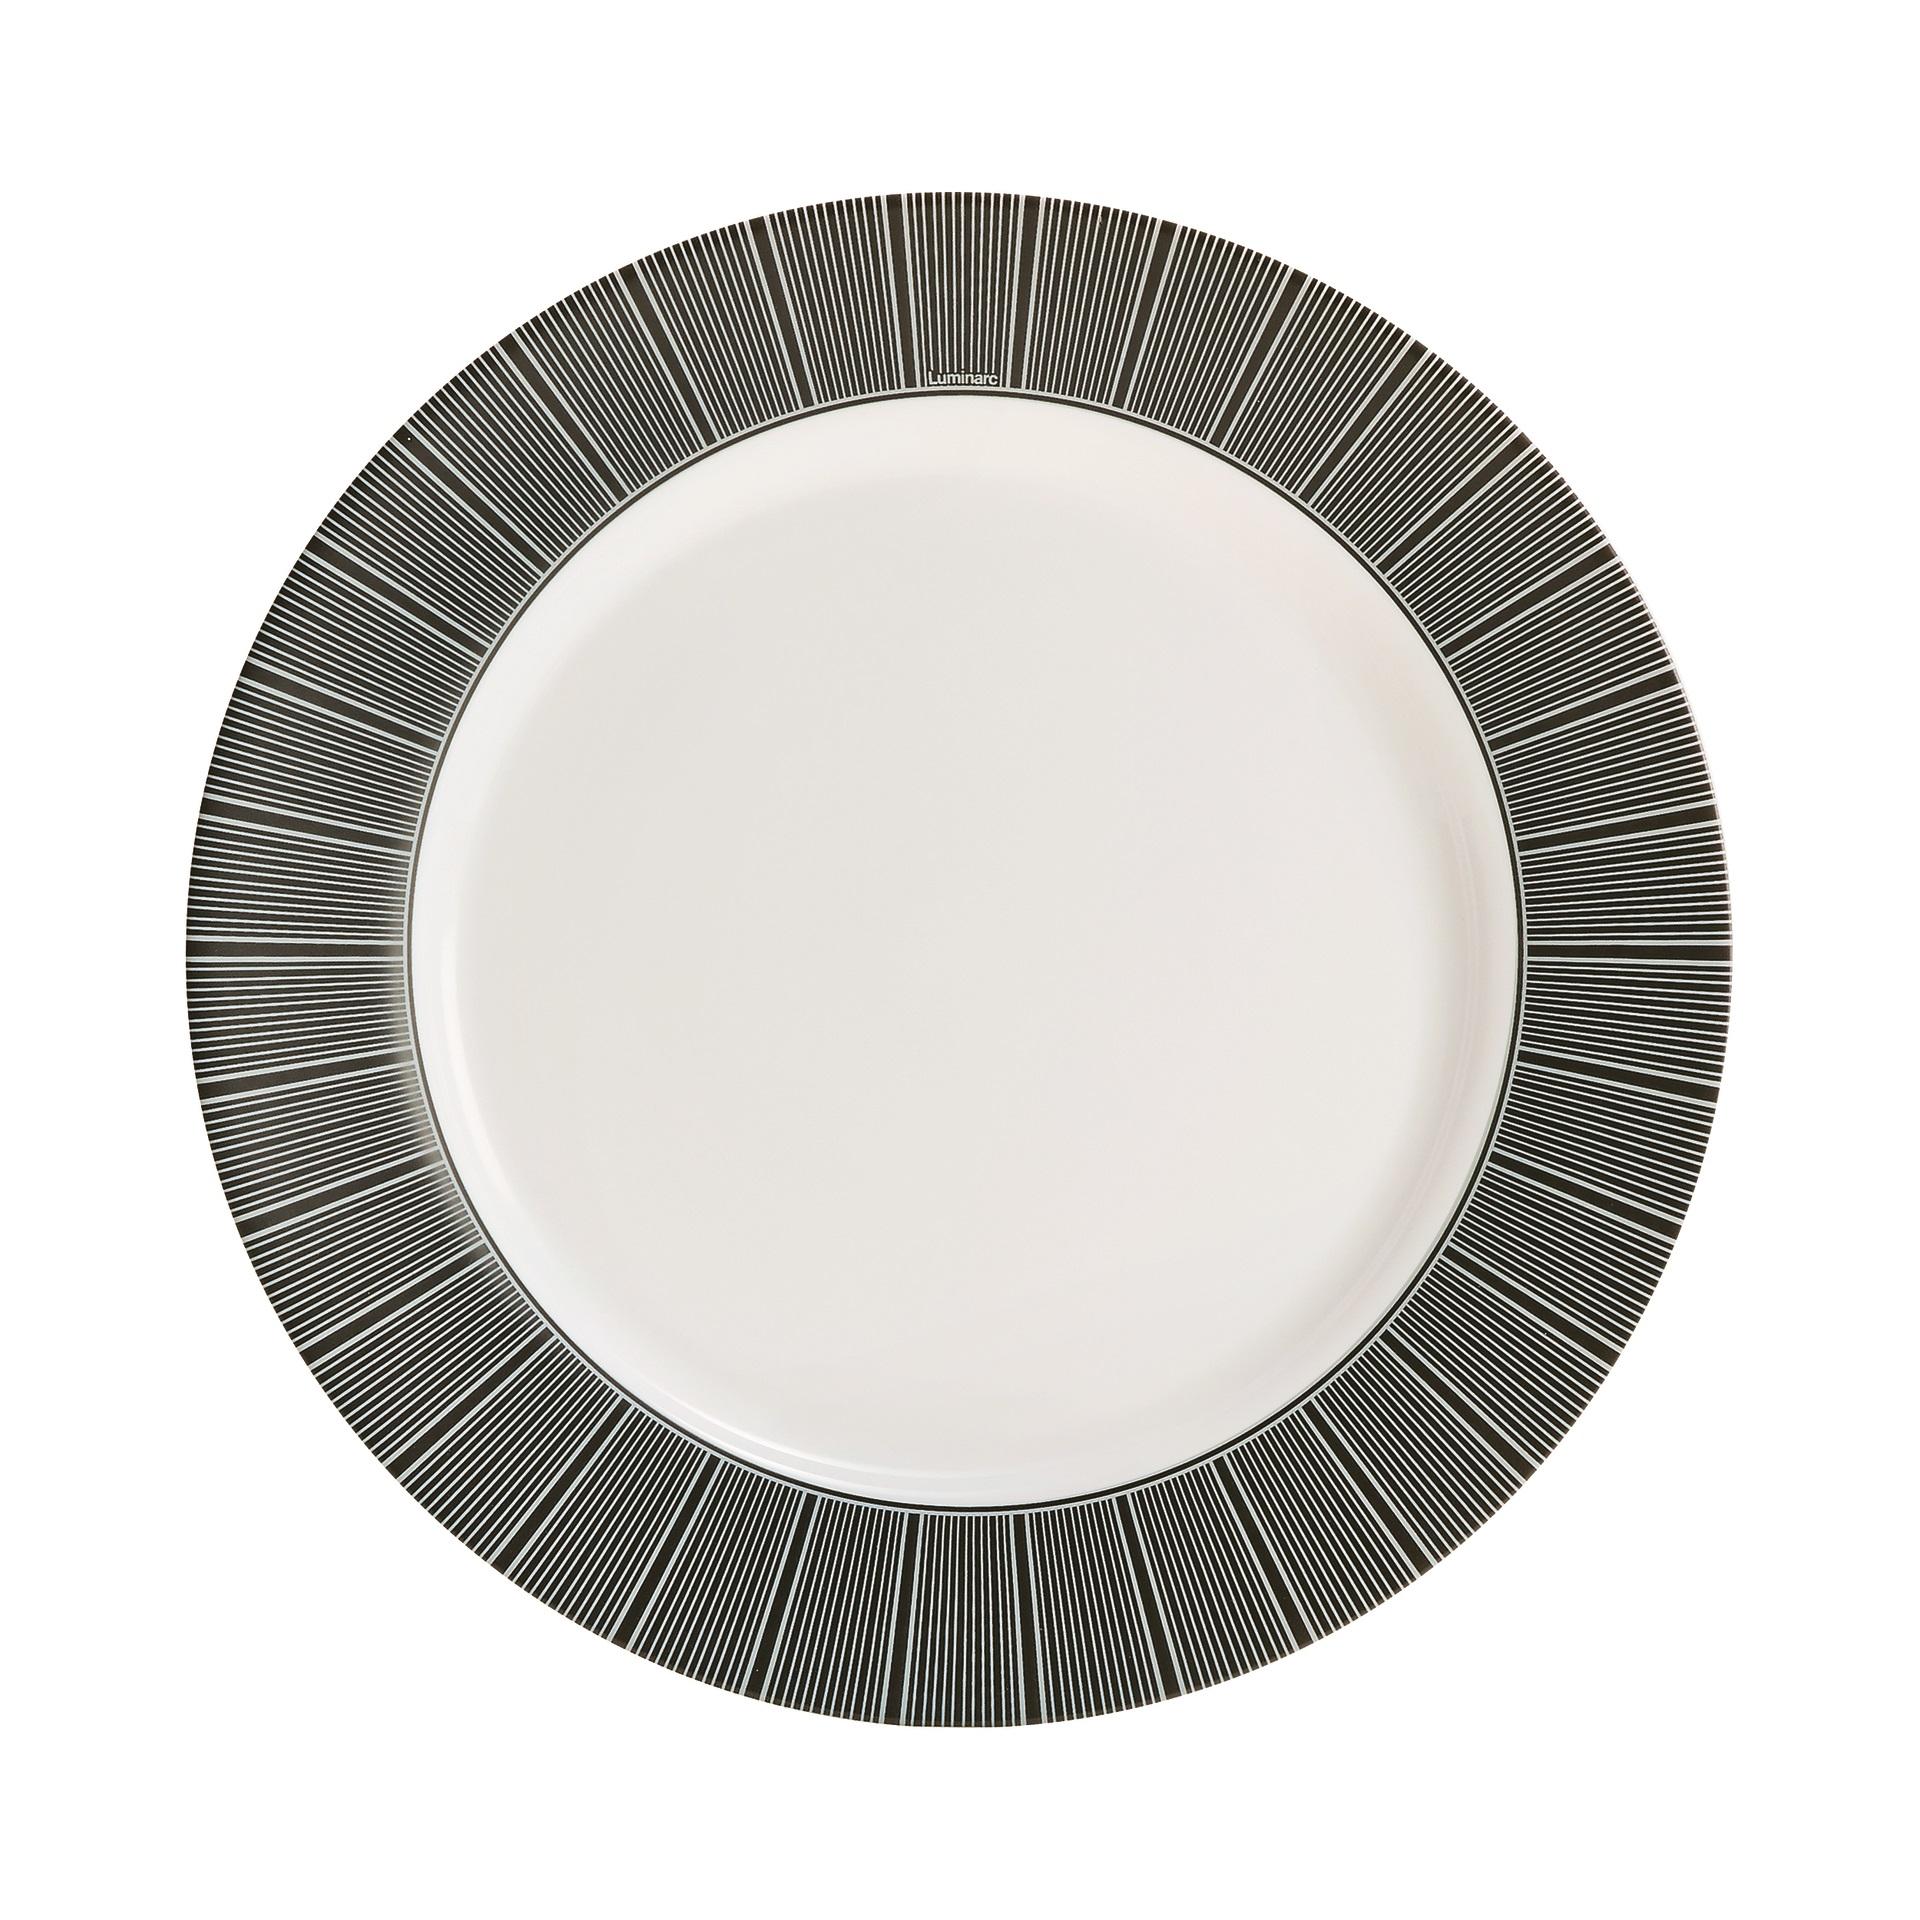 Тарелка обеденная Luminarc Astre black 26 см luminarc тарелка обеденная armoise 25 см белый